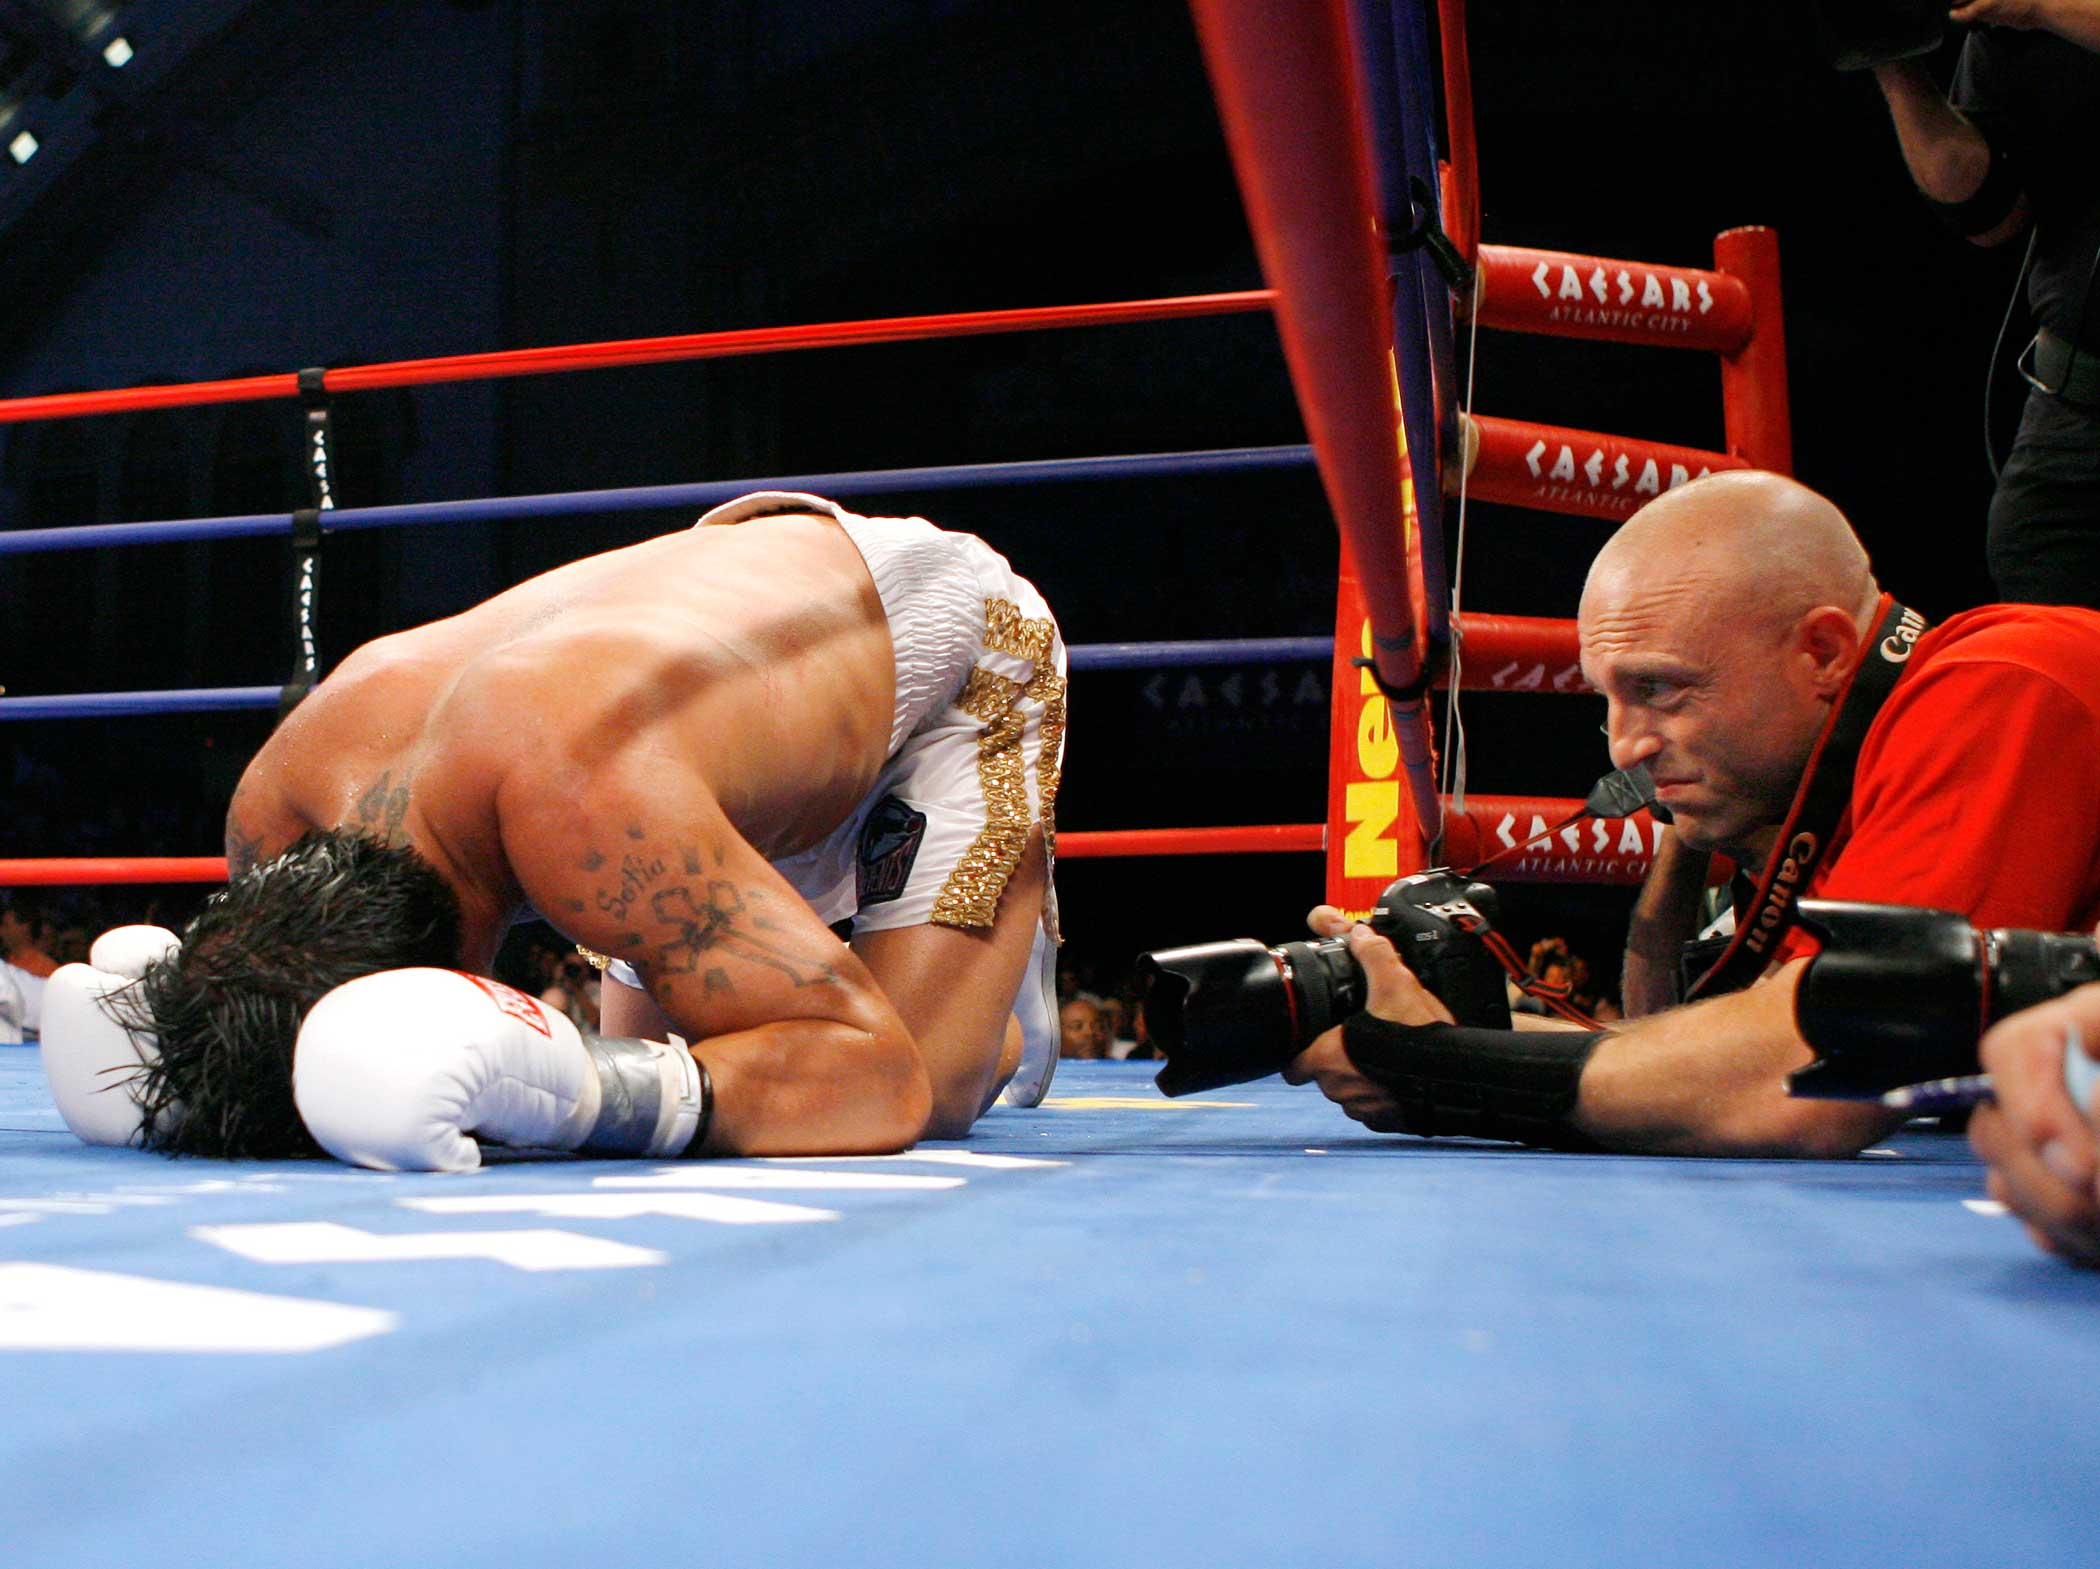 Al watches boxer Arturo Gatti during a match against Alfanso Gomez in Atlantic City, NJ.